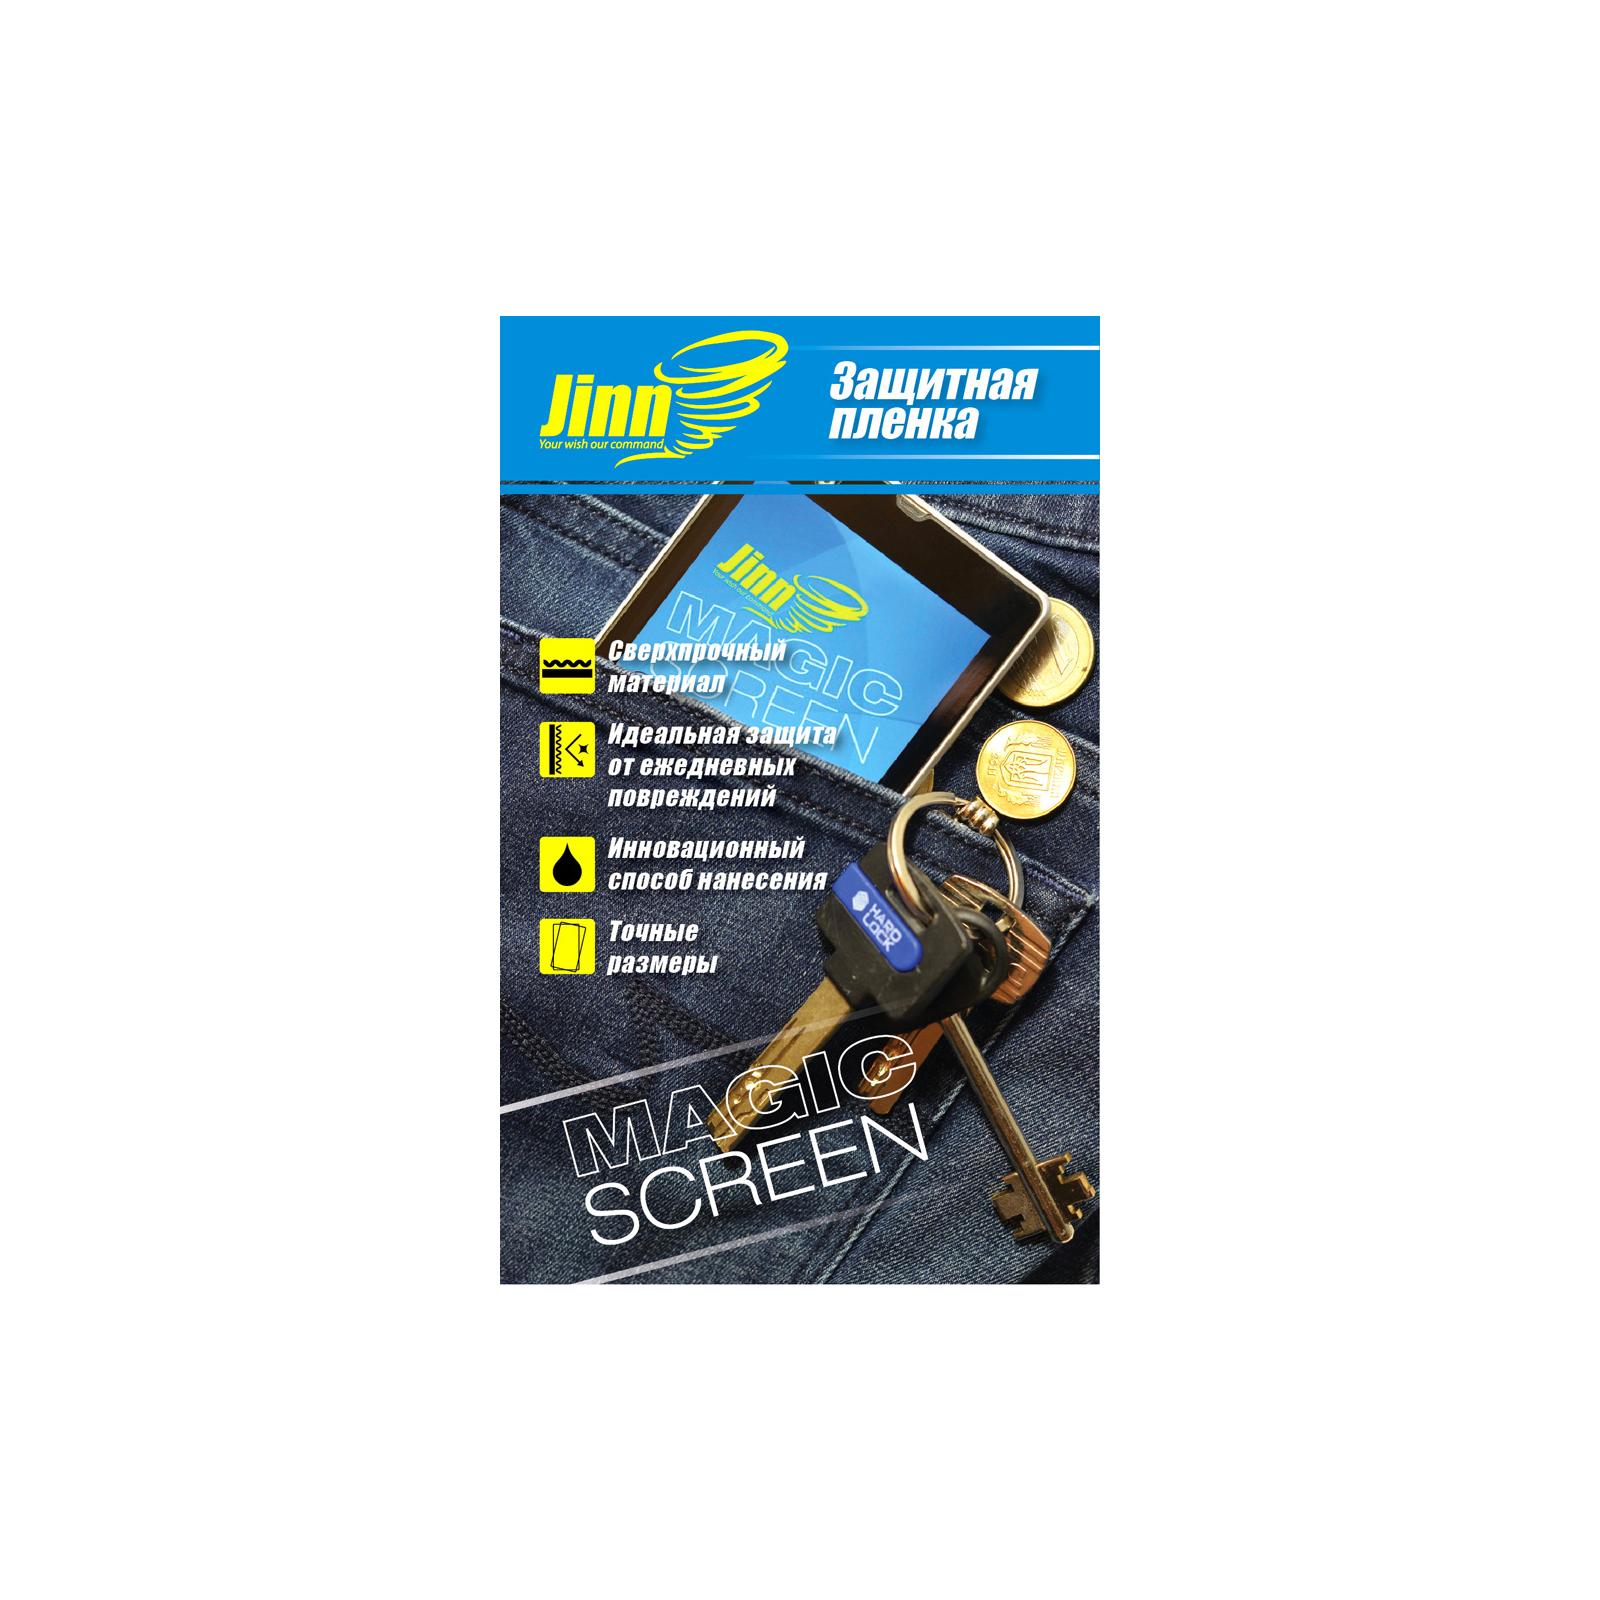 Пленка защитная JINN ультрапрочная Magic Screen для Fly IQ451 Vista (Fly IQ451 Vista front)